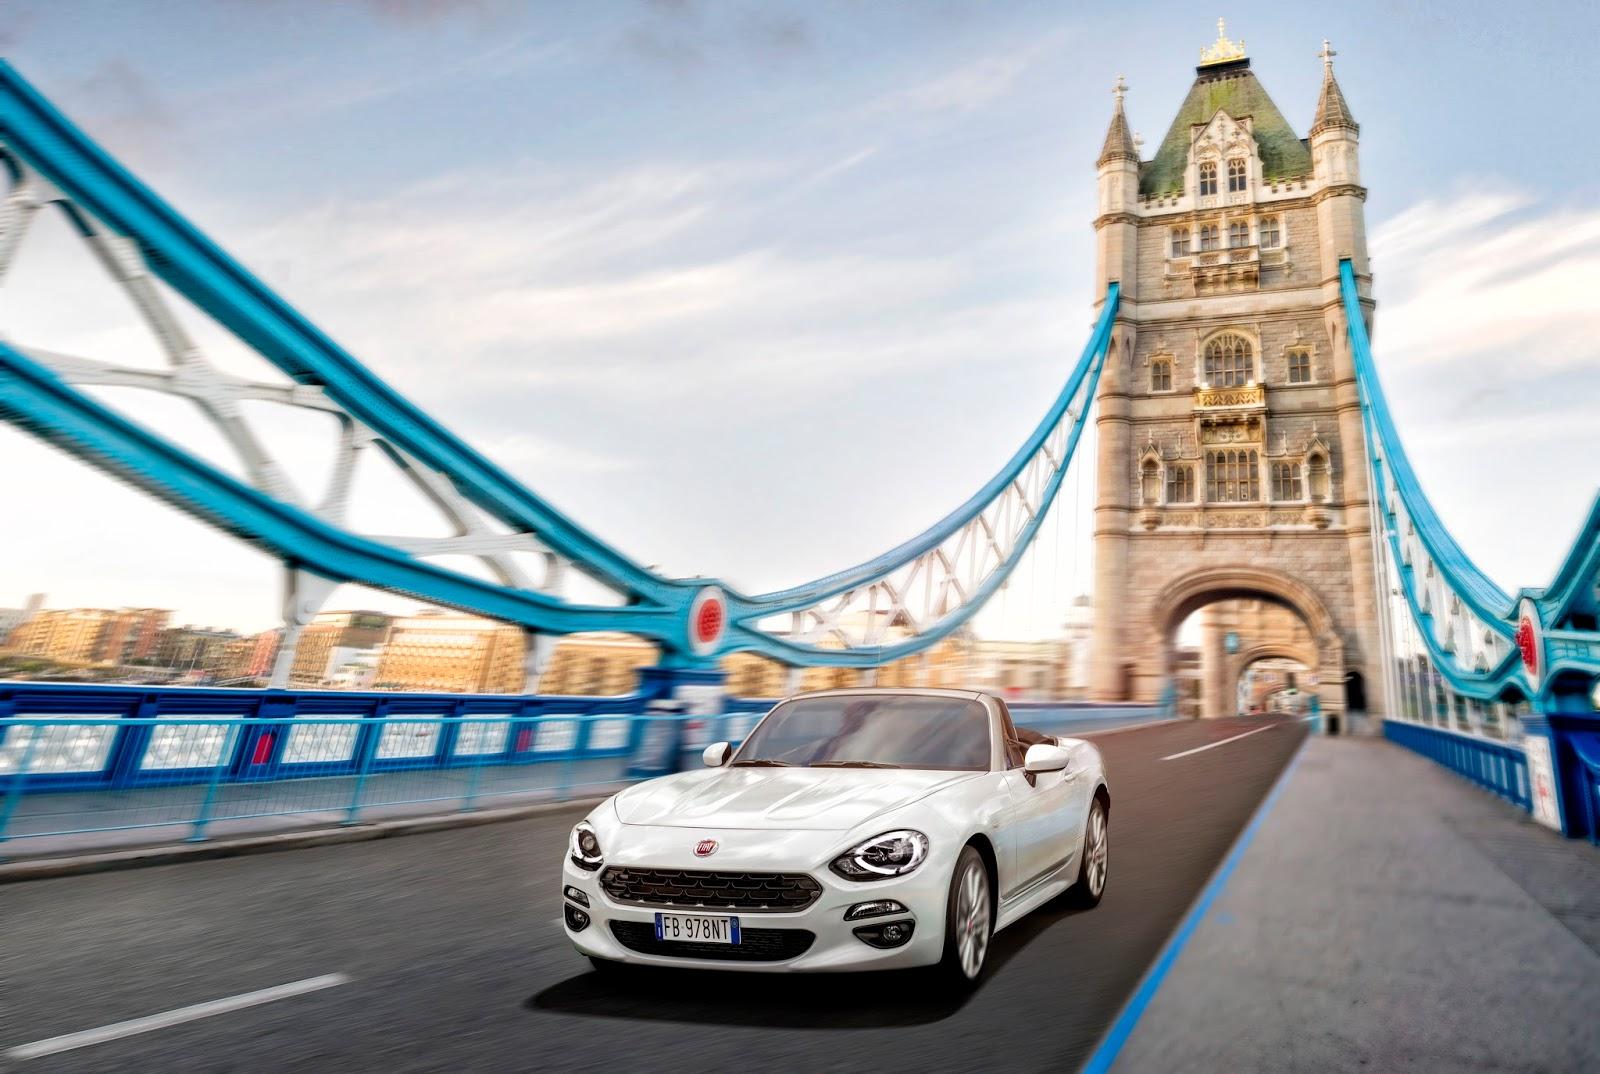 LONDRA Το Fiat 124 Spider άρχισε τις εξορμήσεις